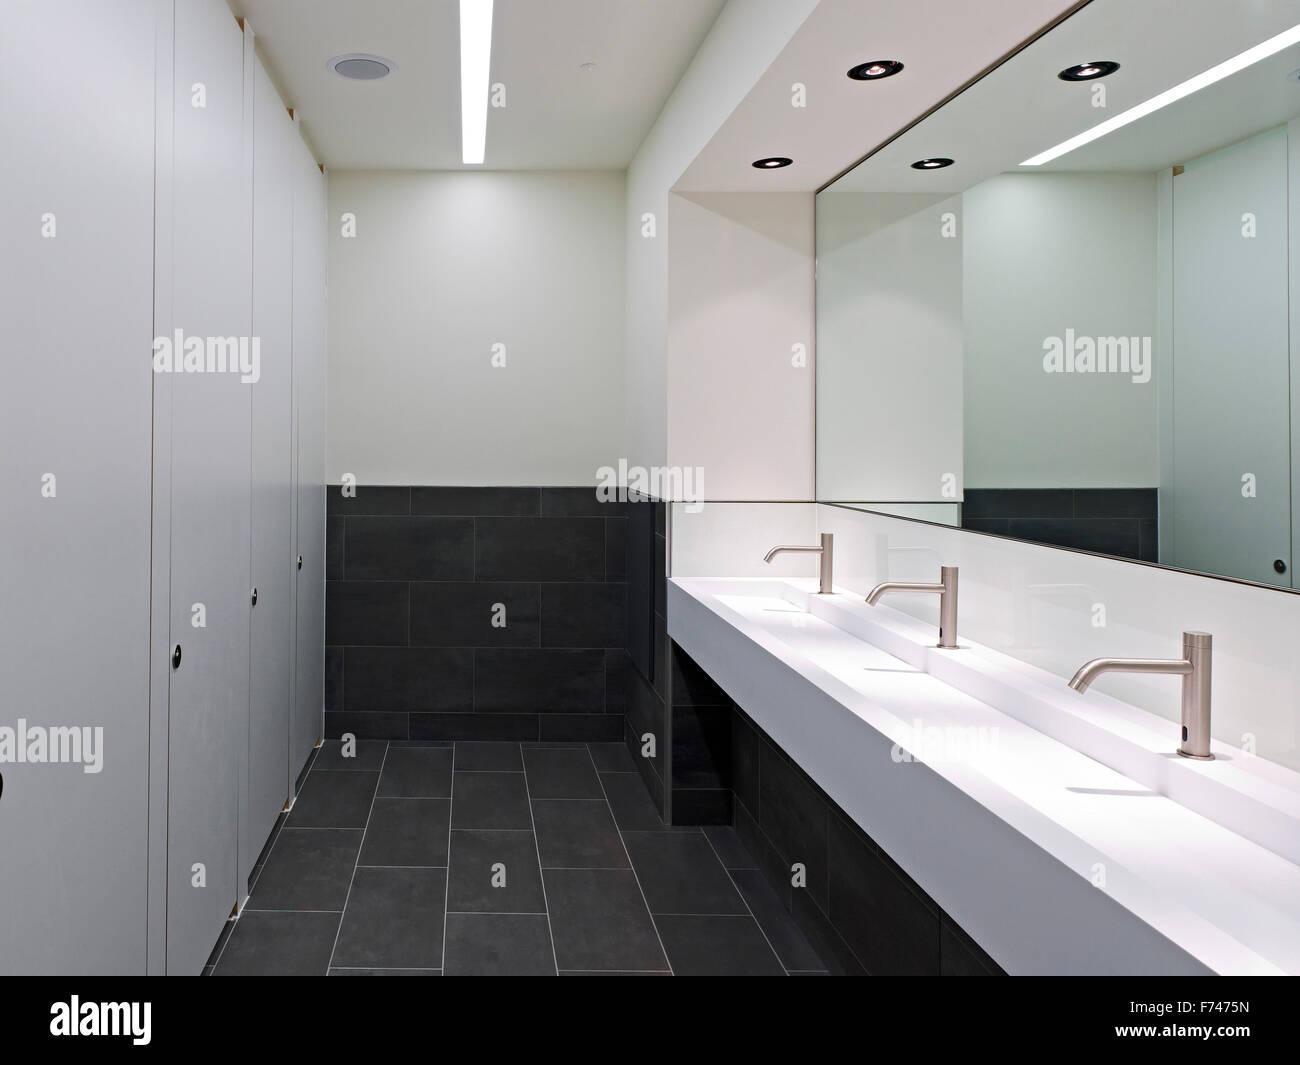 Bathroom facilities in Exchange Tower, Docklands, London, England, UK - Stock Image